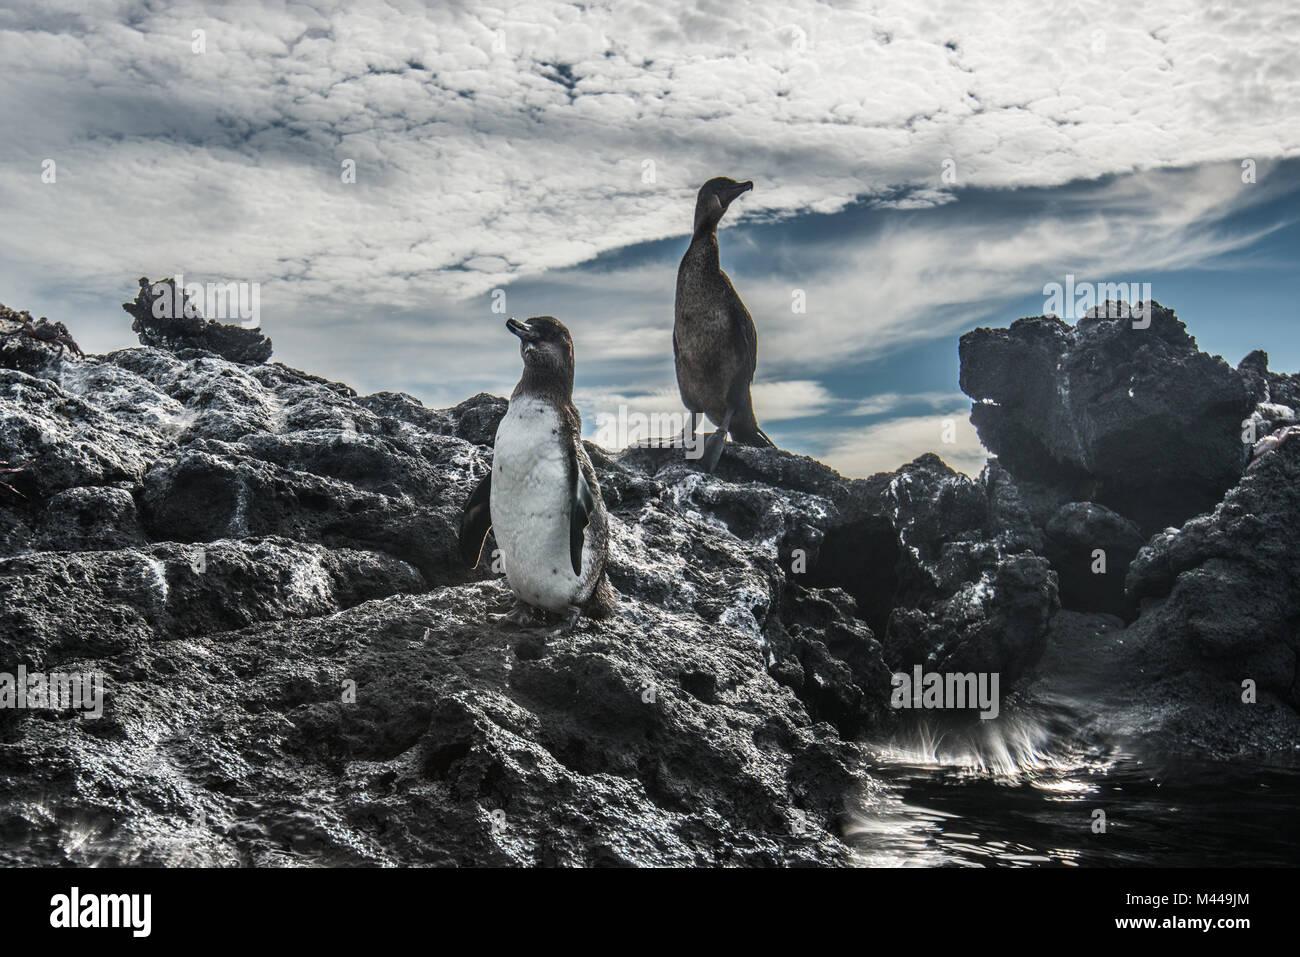 Galapagos Penguin and Flightless Cormorant resting on rocks, Seymour, Galapagos, Ecuador - Stock Image